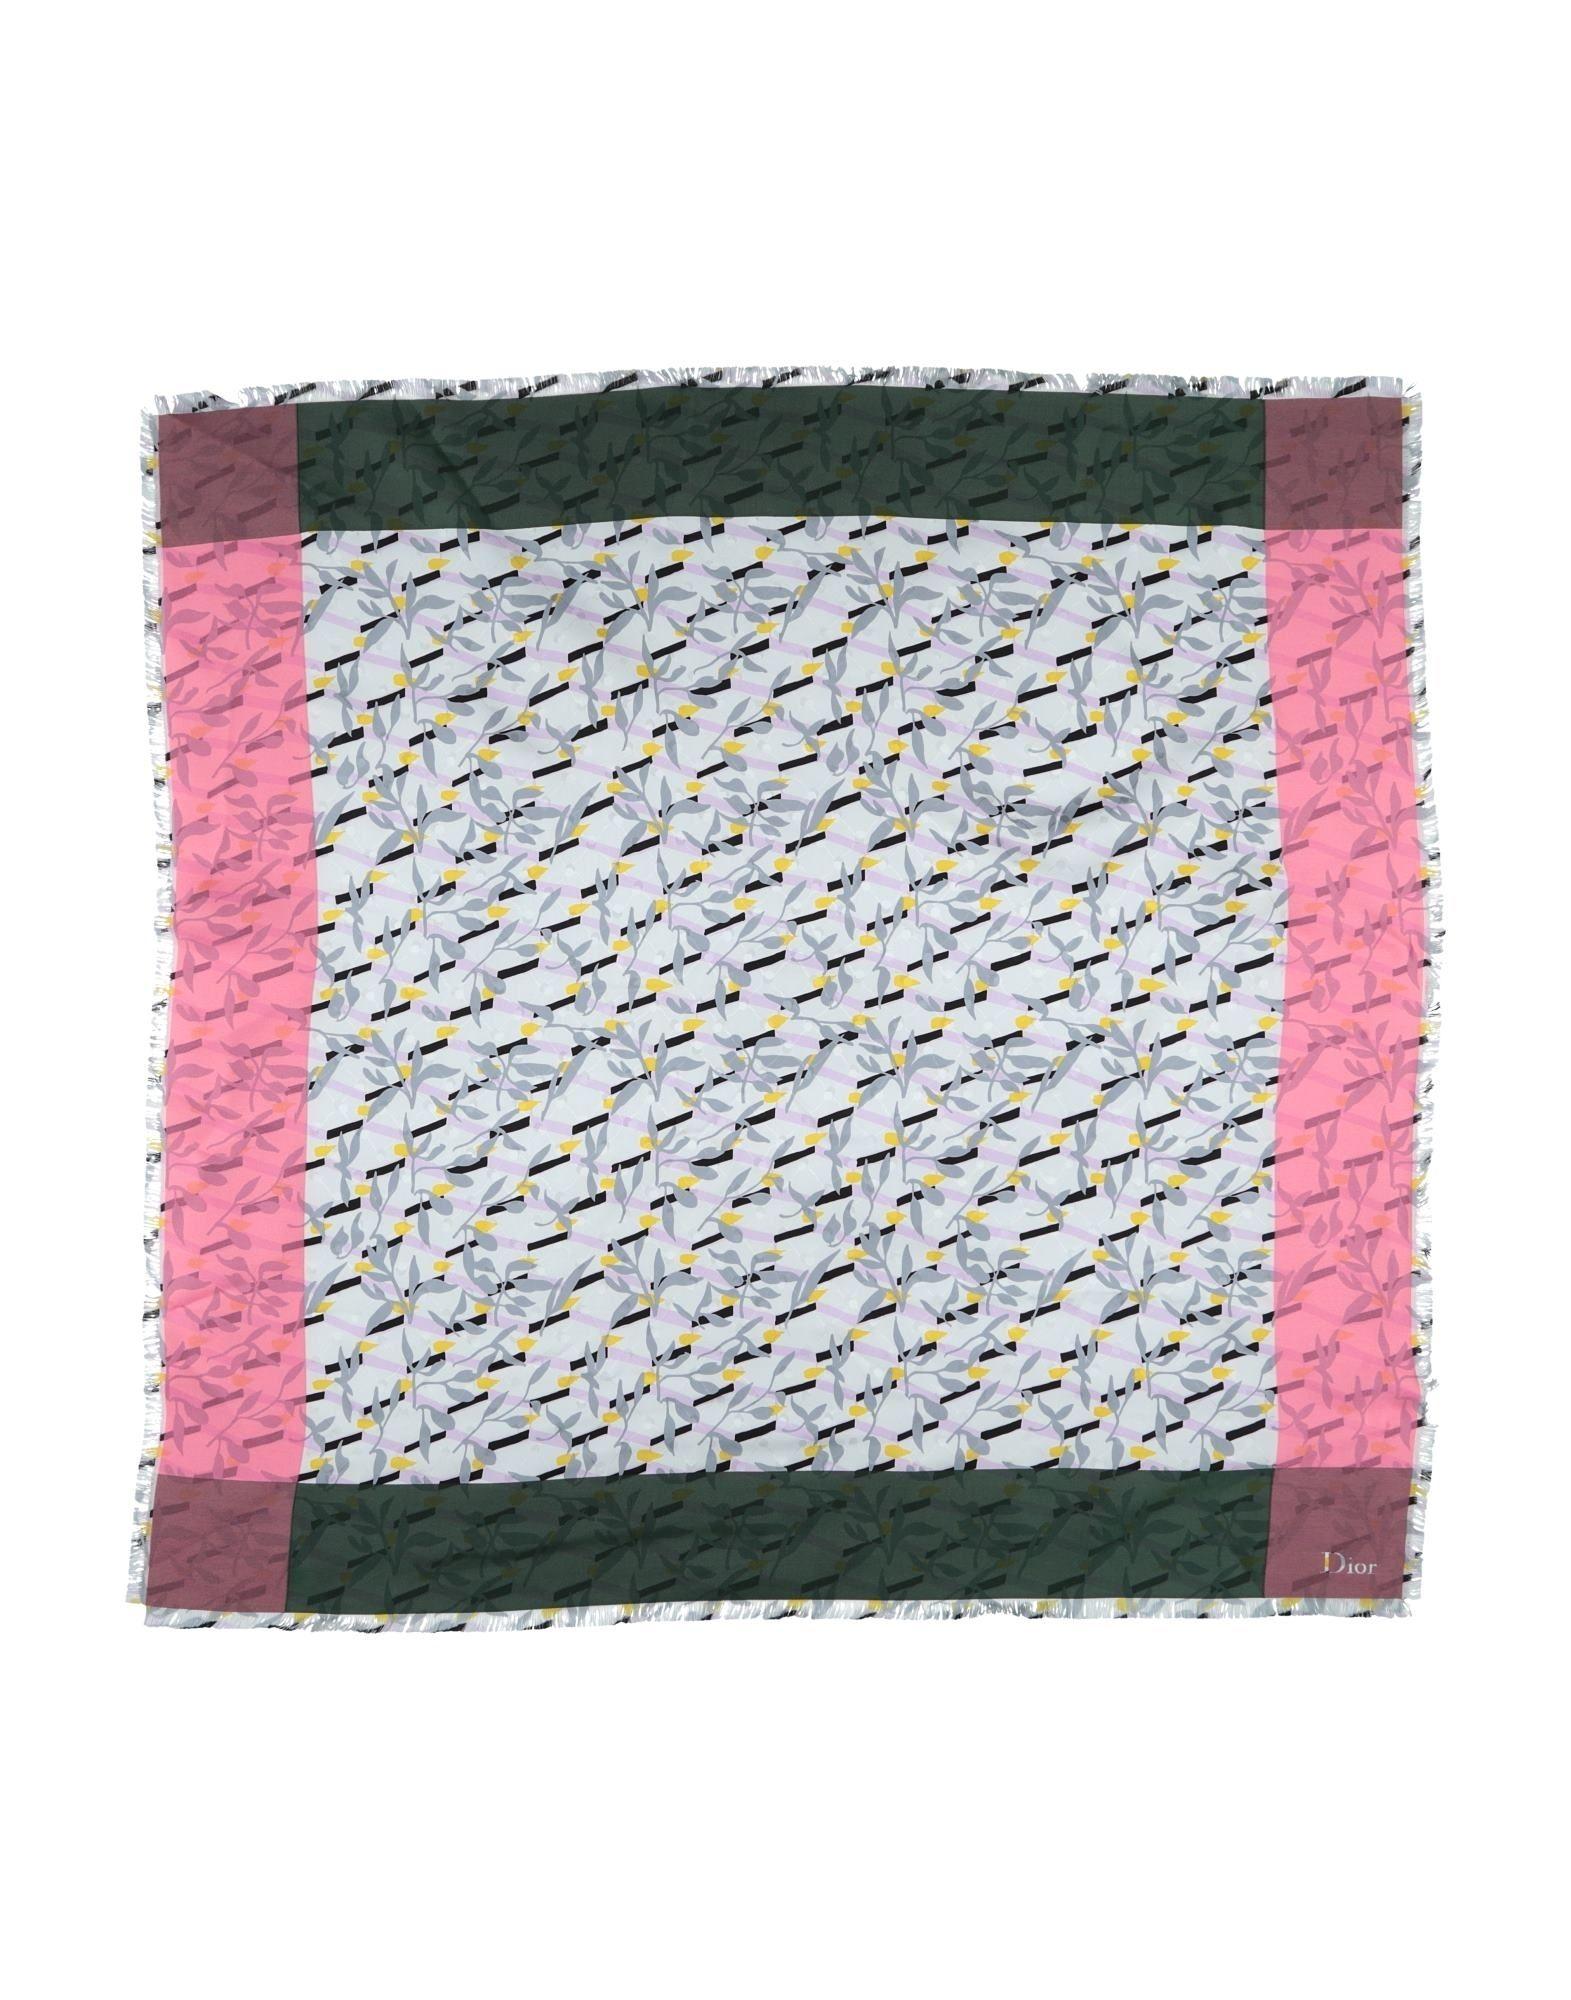 DIOR Платок ostin платок в мелкий принт лисички page 4